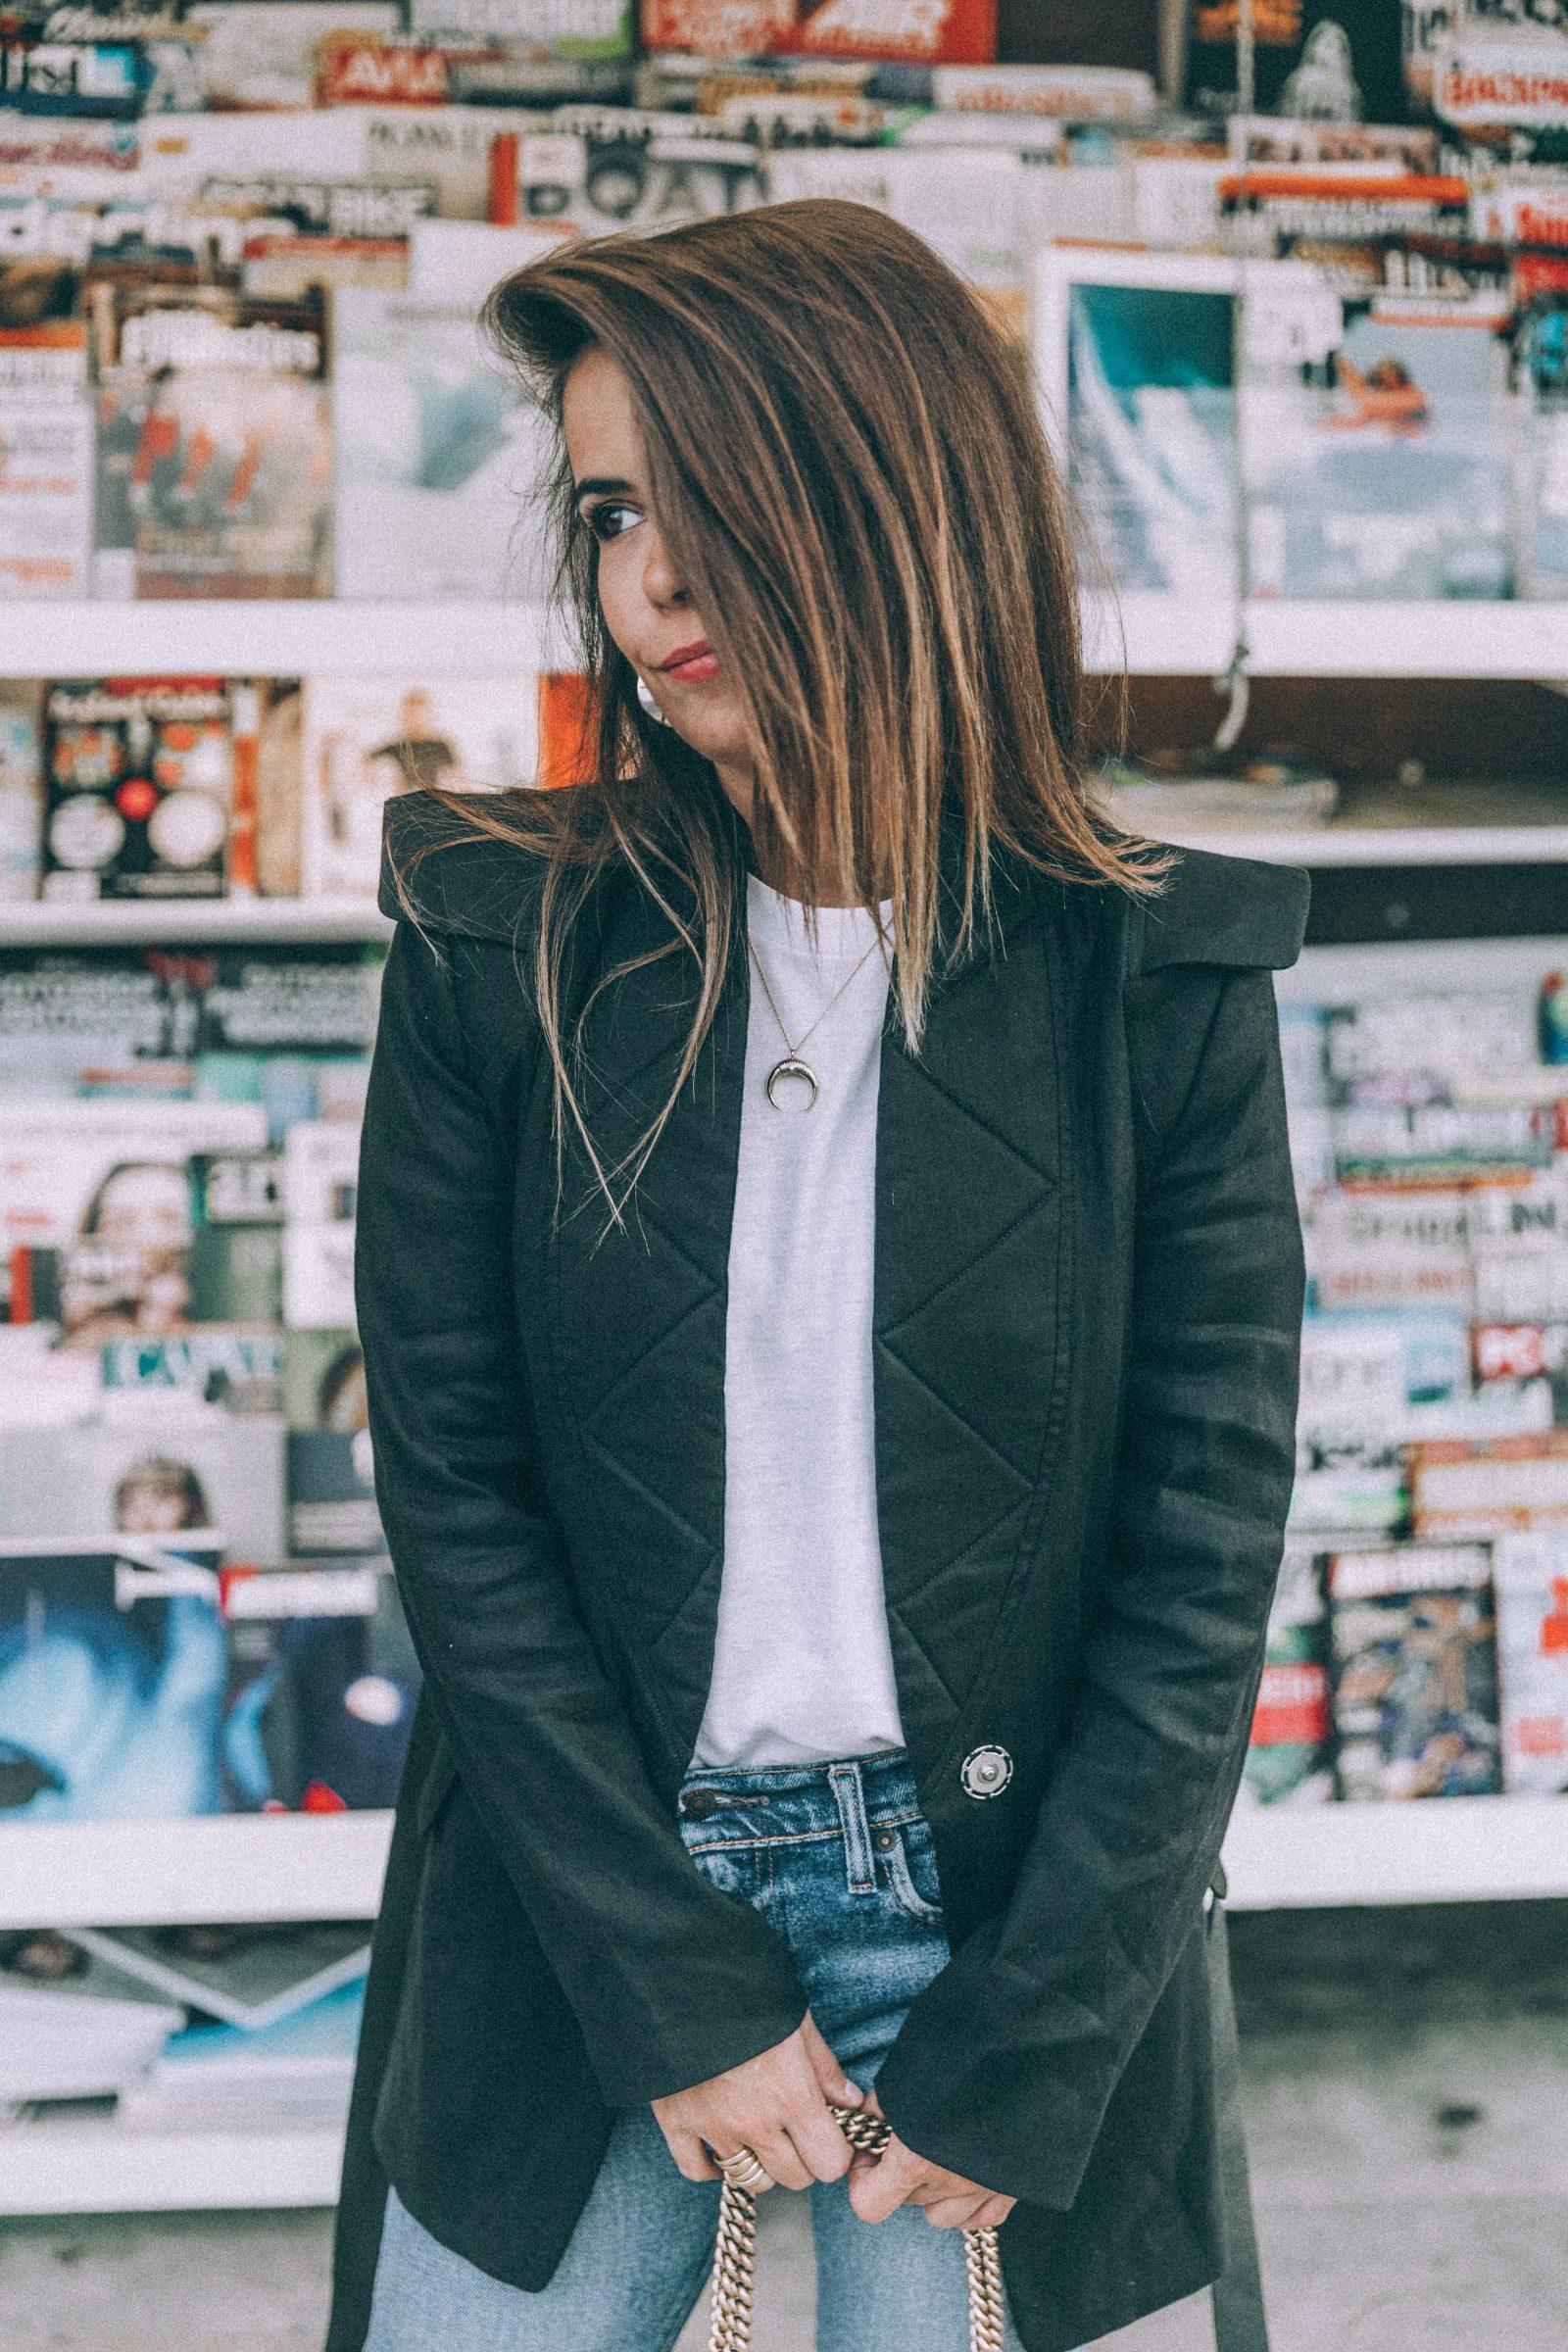 red_bag-snake_boots-gucci-levis-jeans-denim-iro_paris-black_blazer-los_angeles-la-fairfax-outfit-street_style-collage_vintage-90